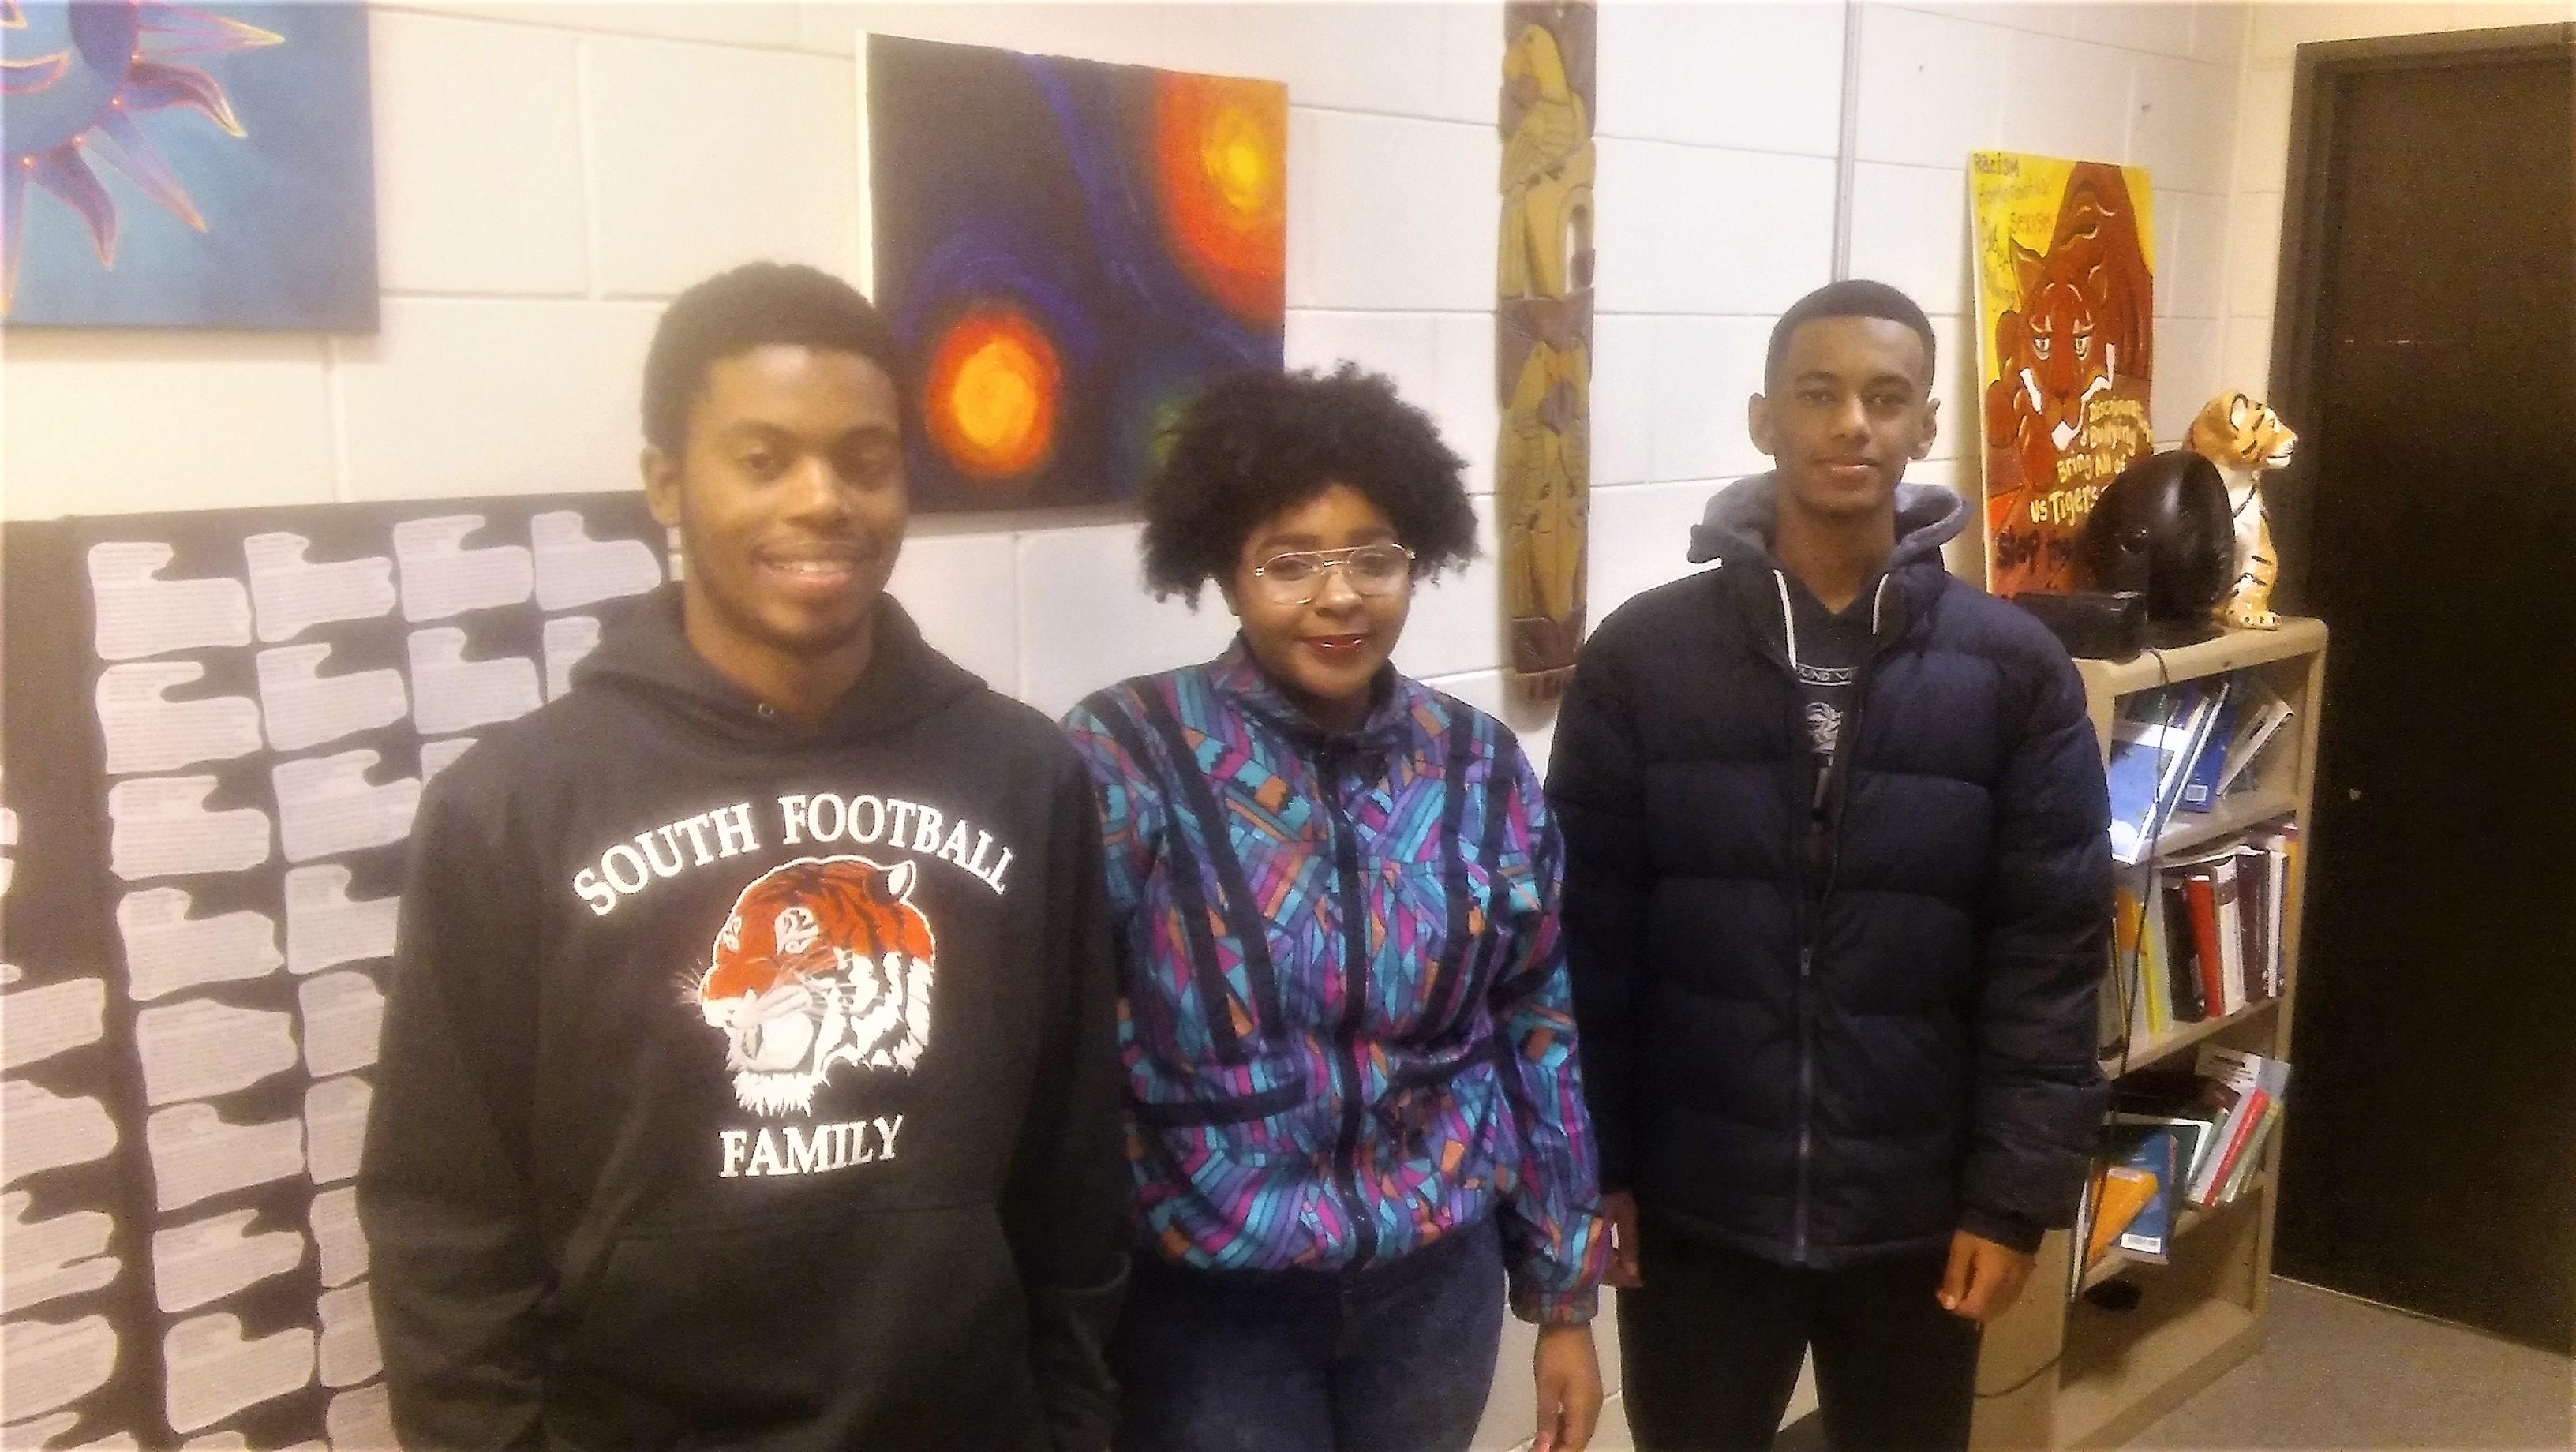 South High School students Clinton Mosley III Diamond Dortch Tiger Worku